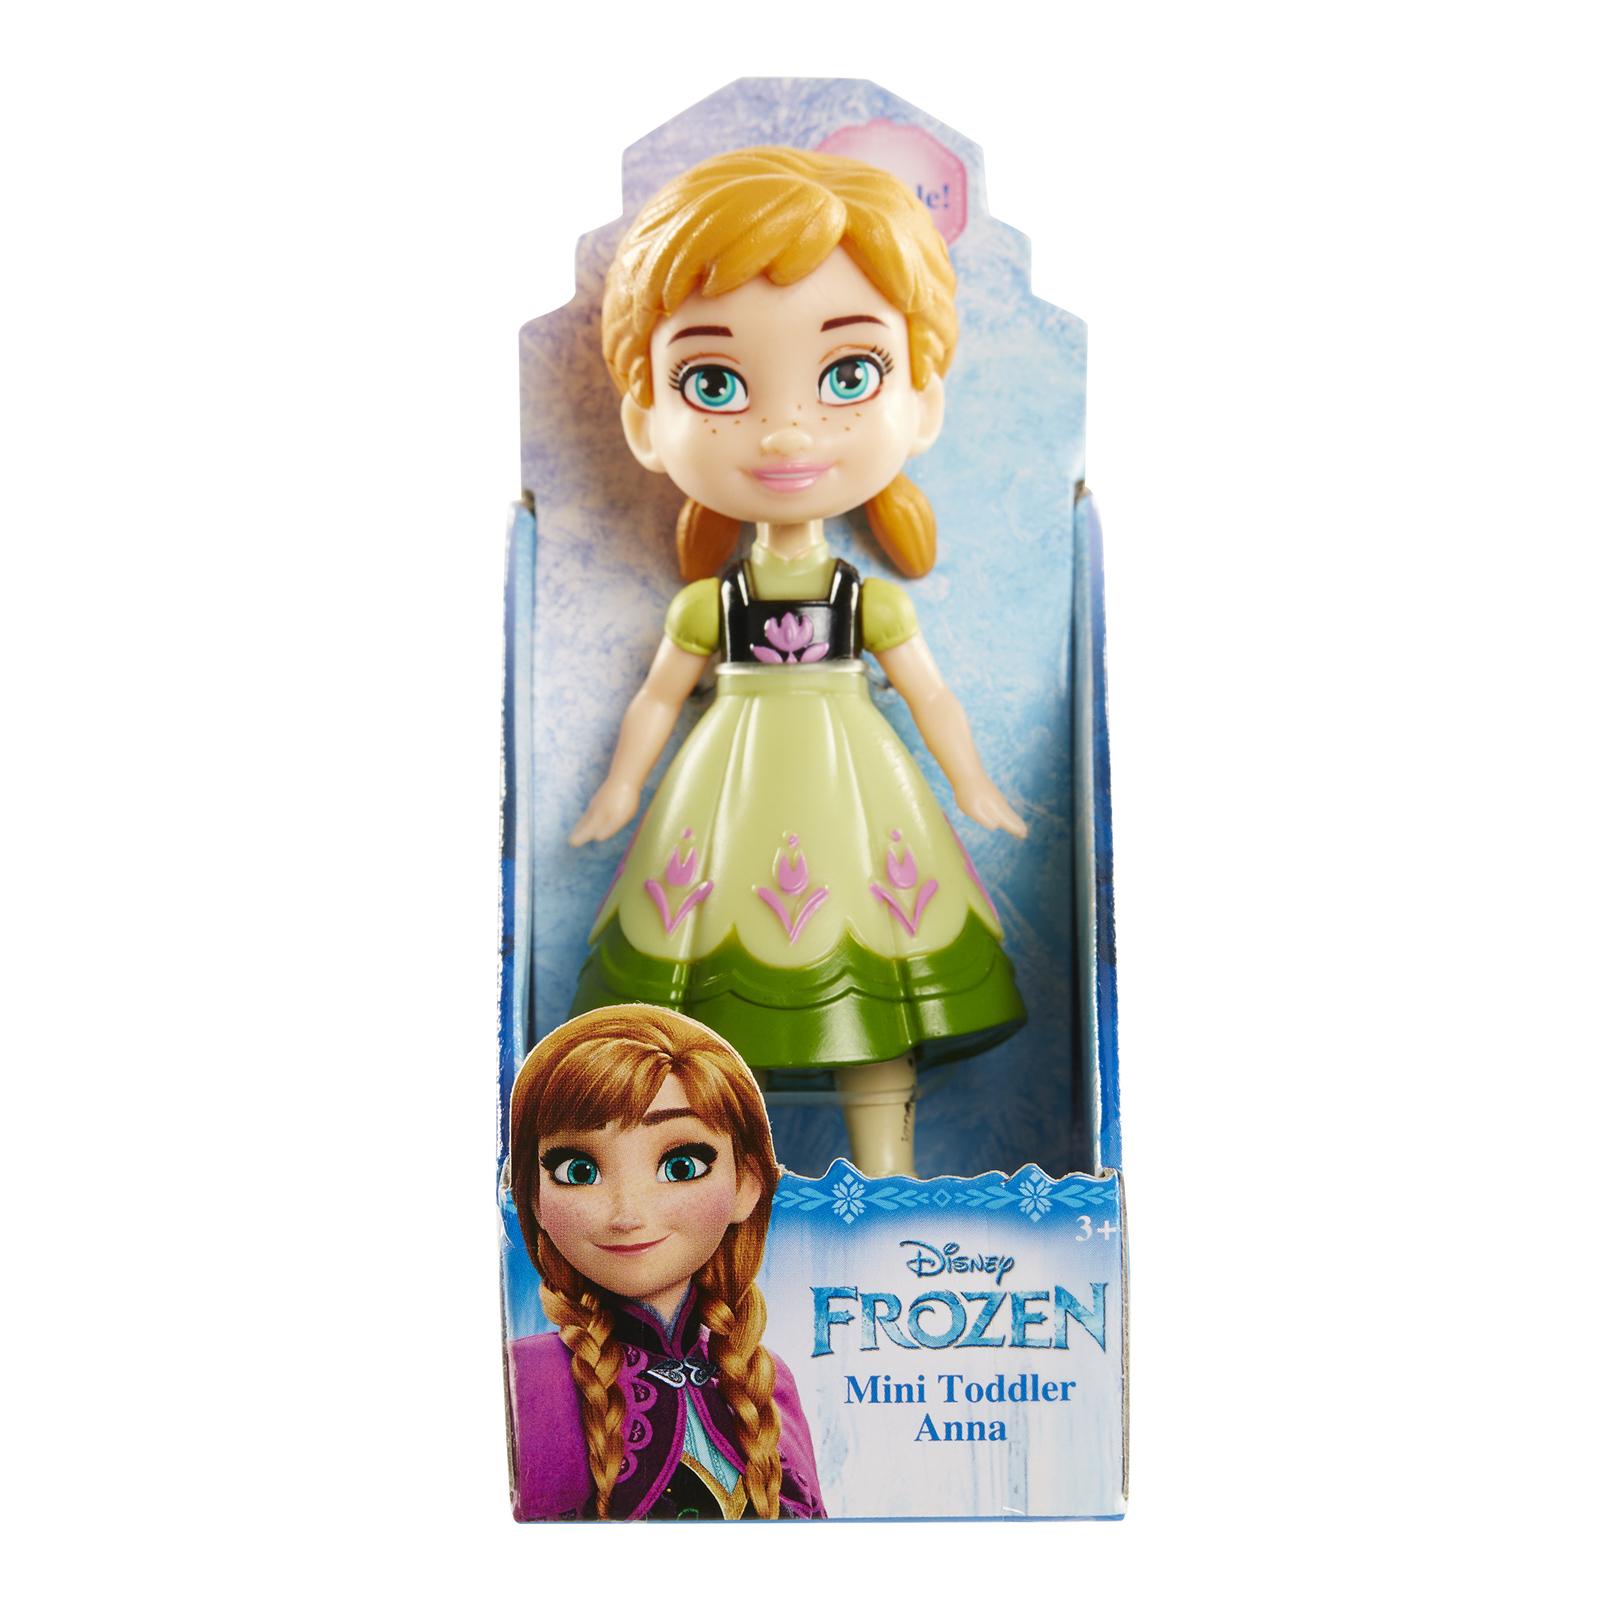 Anna (Green Dress) - Mini Toddler Doll image